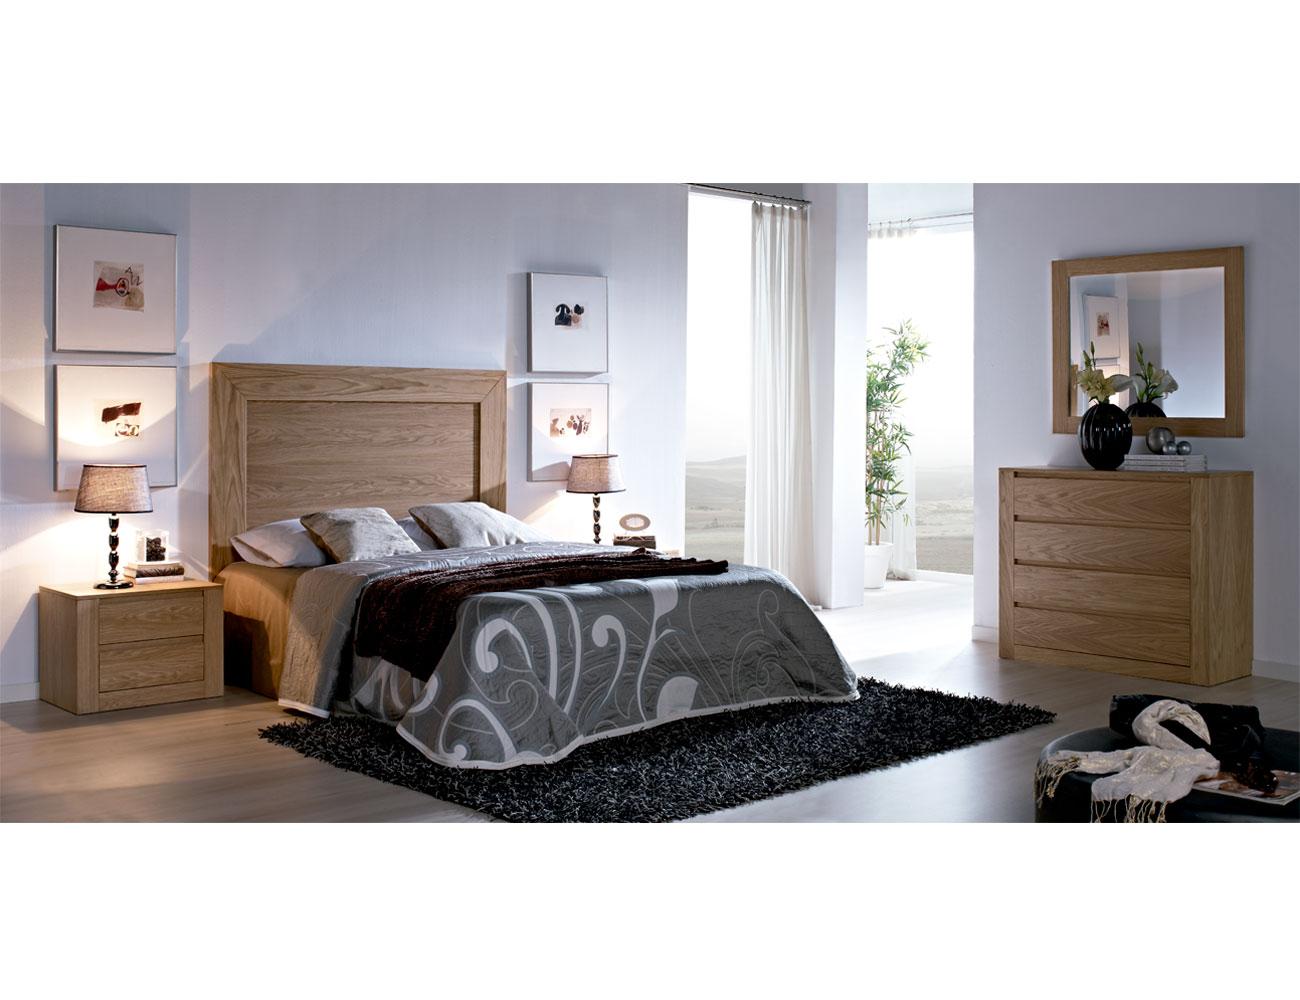 Dormitorio matrimonio comoda narvik